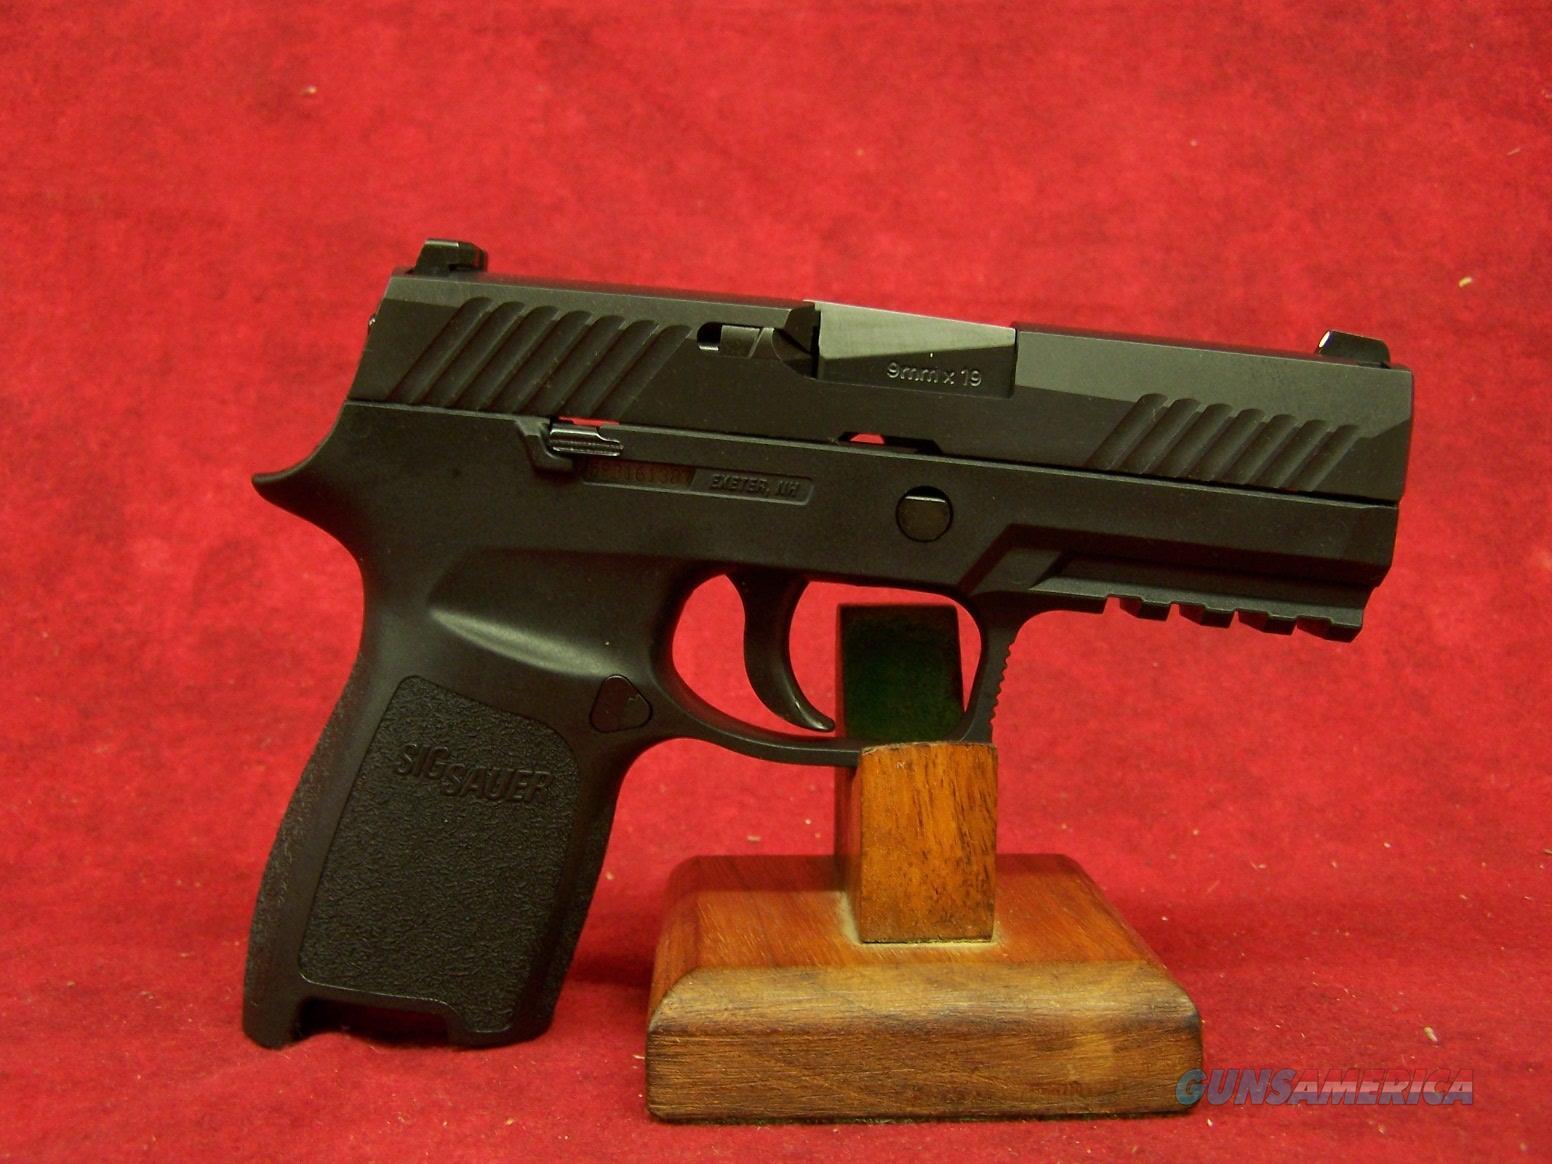 "Sig Sauer 320 Compact 9mm 3.9"" Barrel (320C-9-B)  Guns > Pistols > Sig - Sauer/Sigarms Pistols > P320"